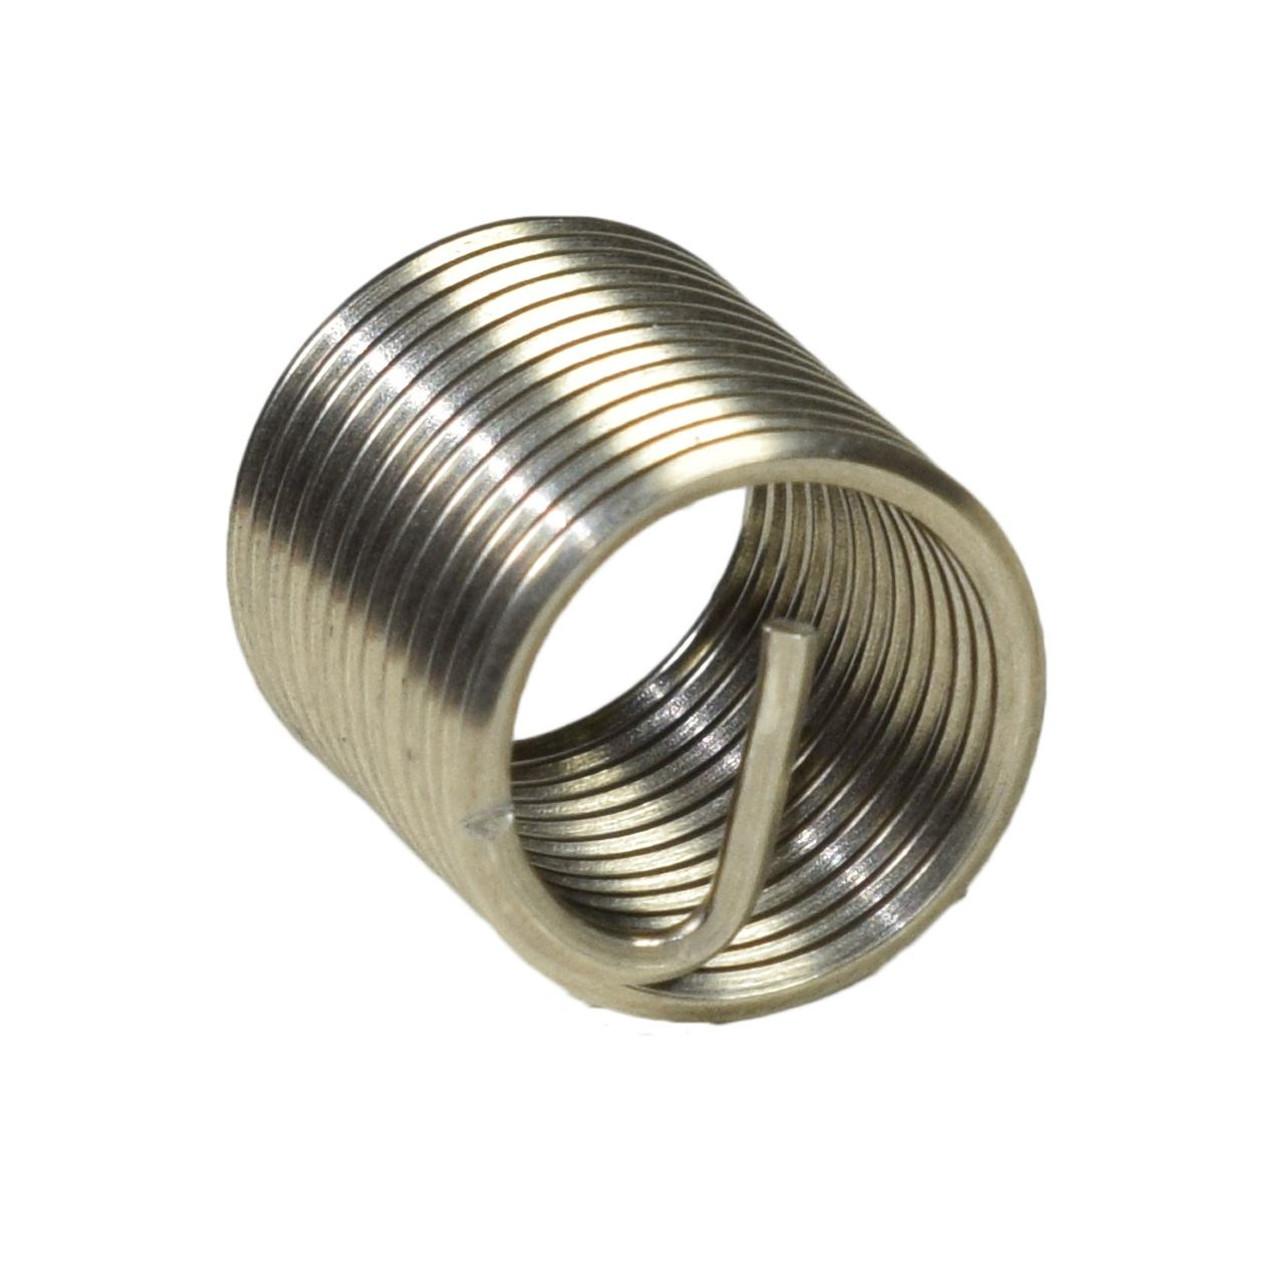 Helicoil Type Thread Repair Inserts 1/2 UNF x 1.5D 10pc Wire Thread Insert